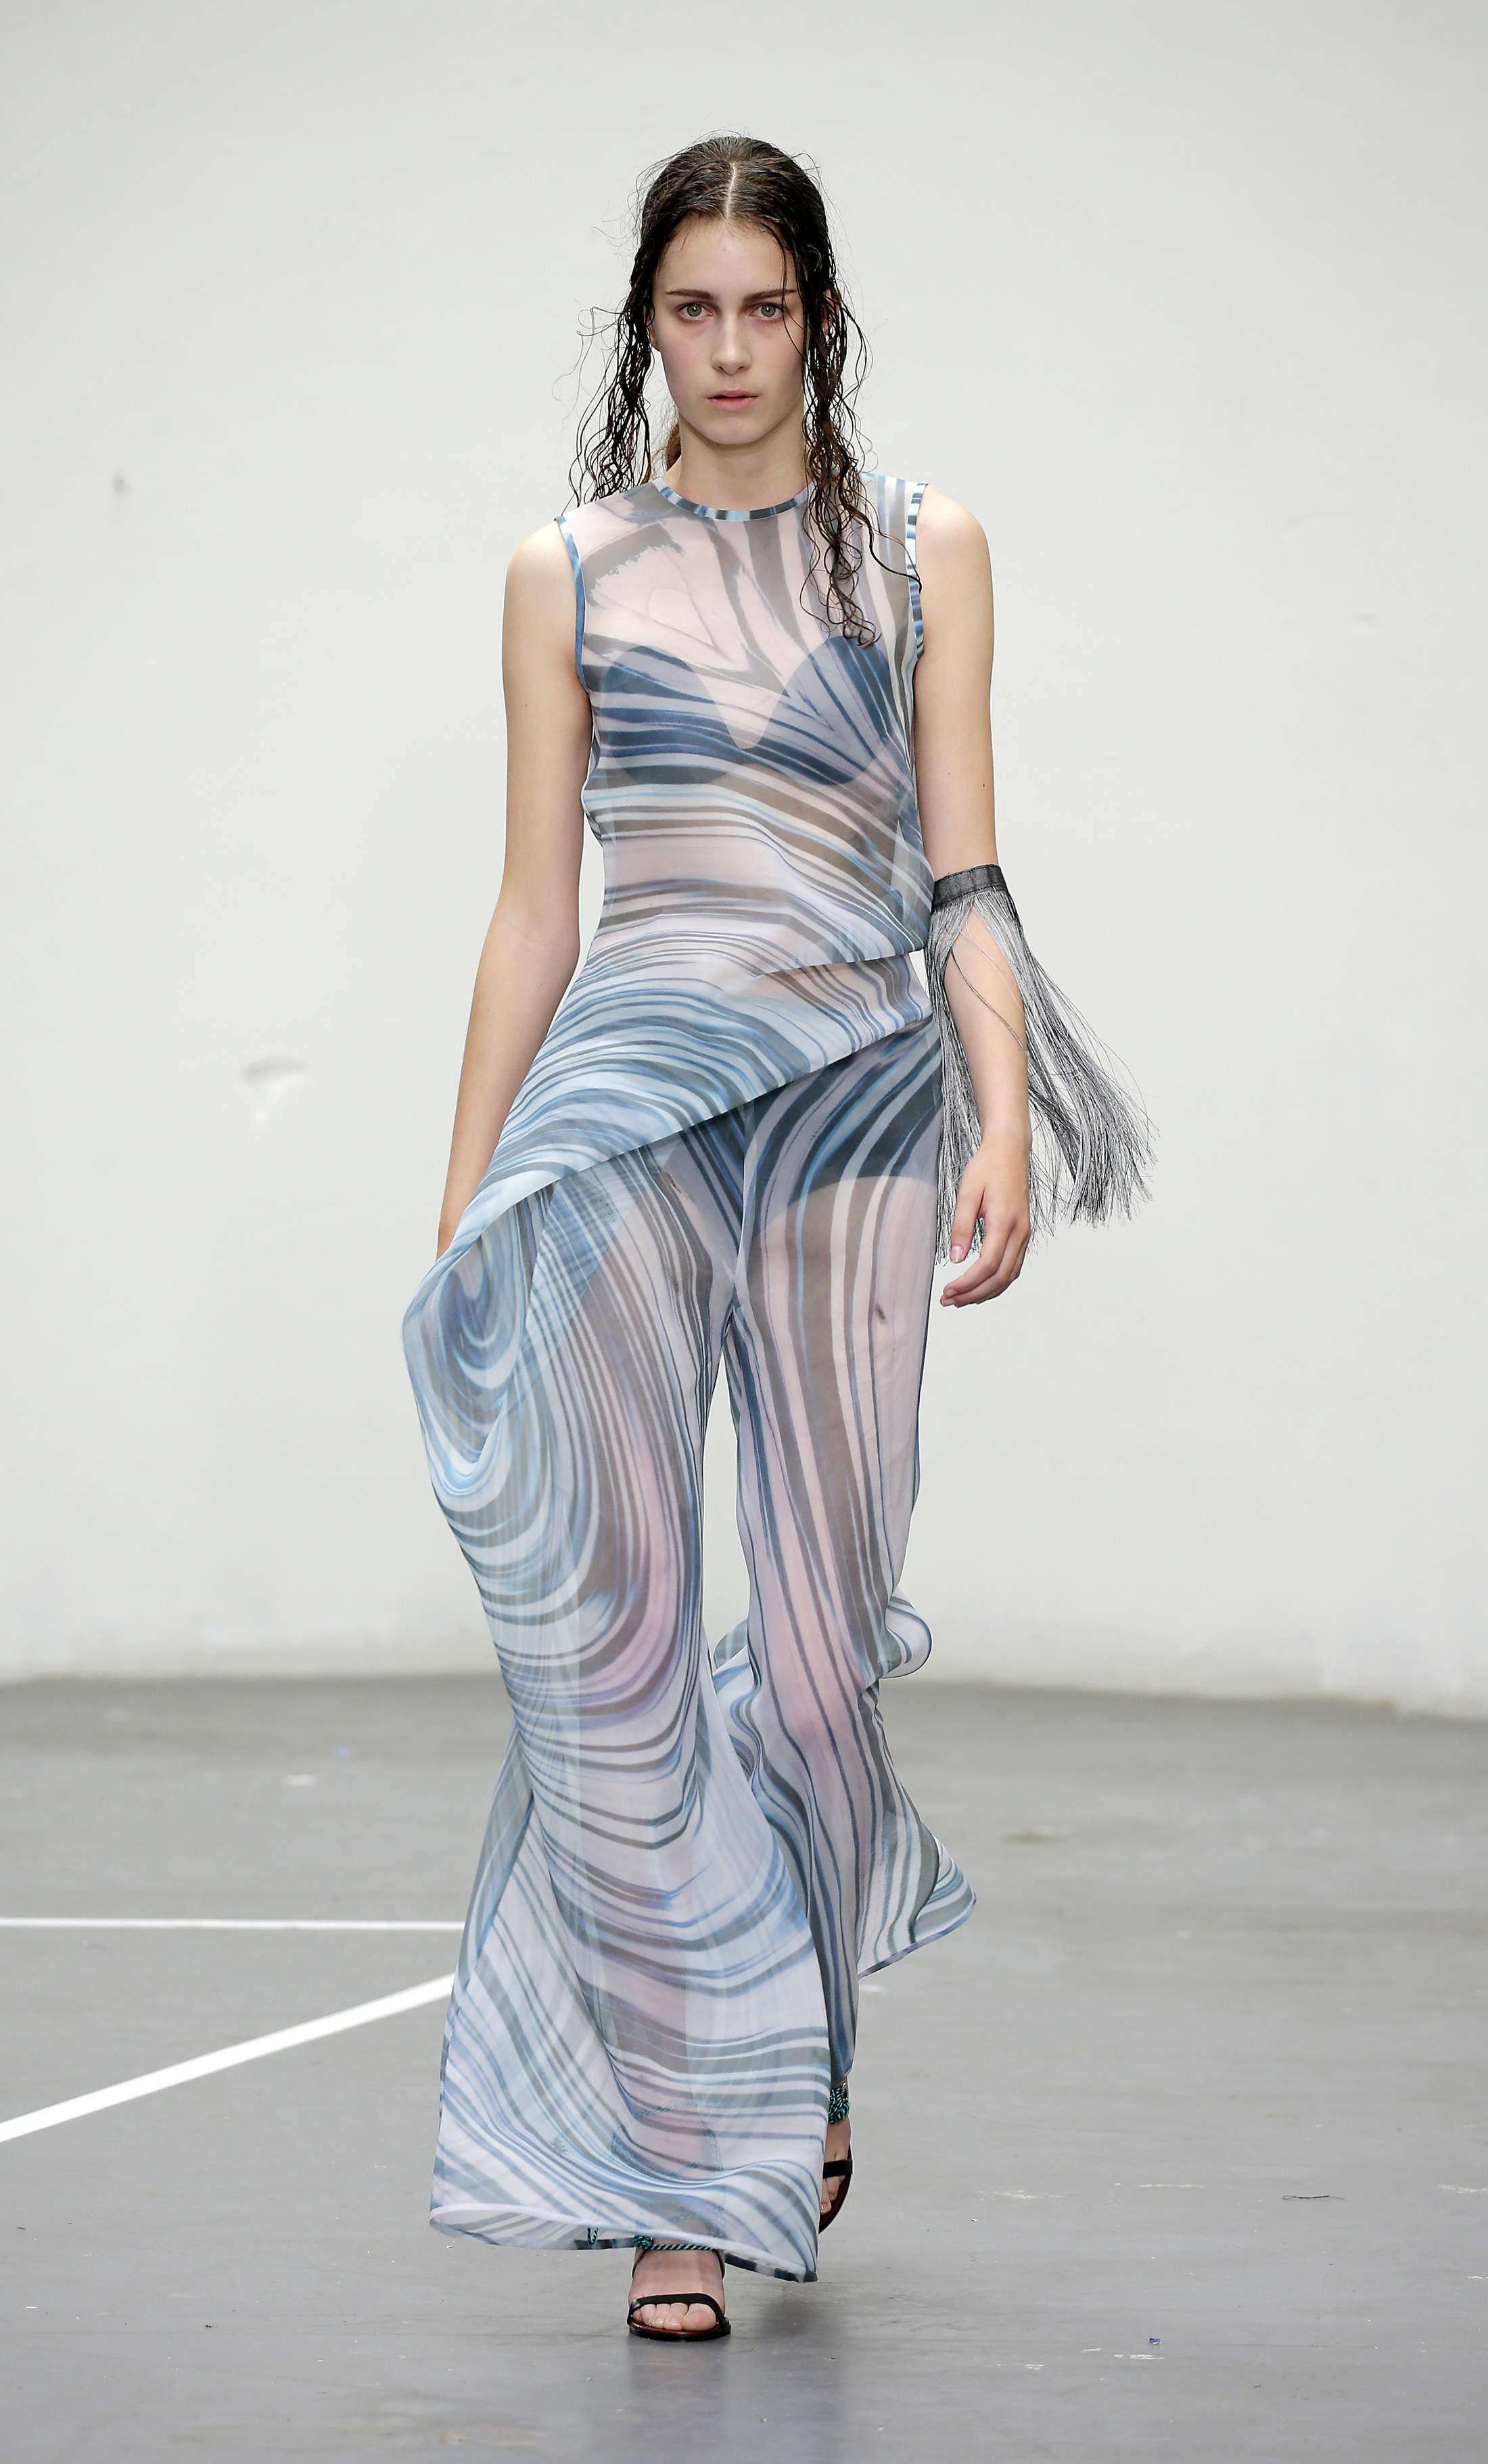 The IDA International fashion design competition